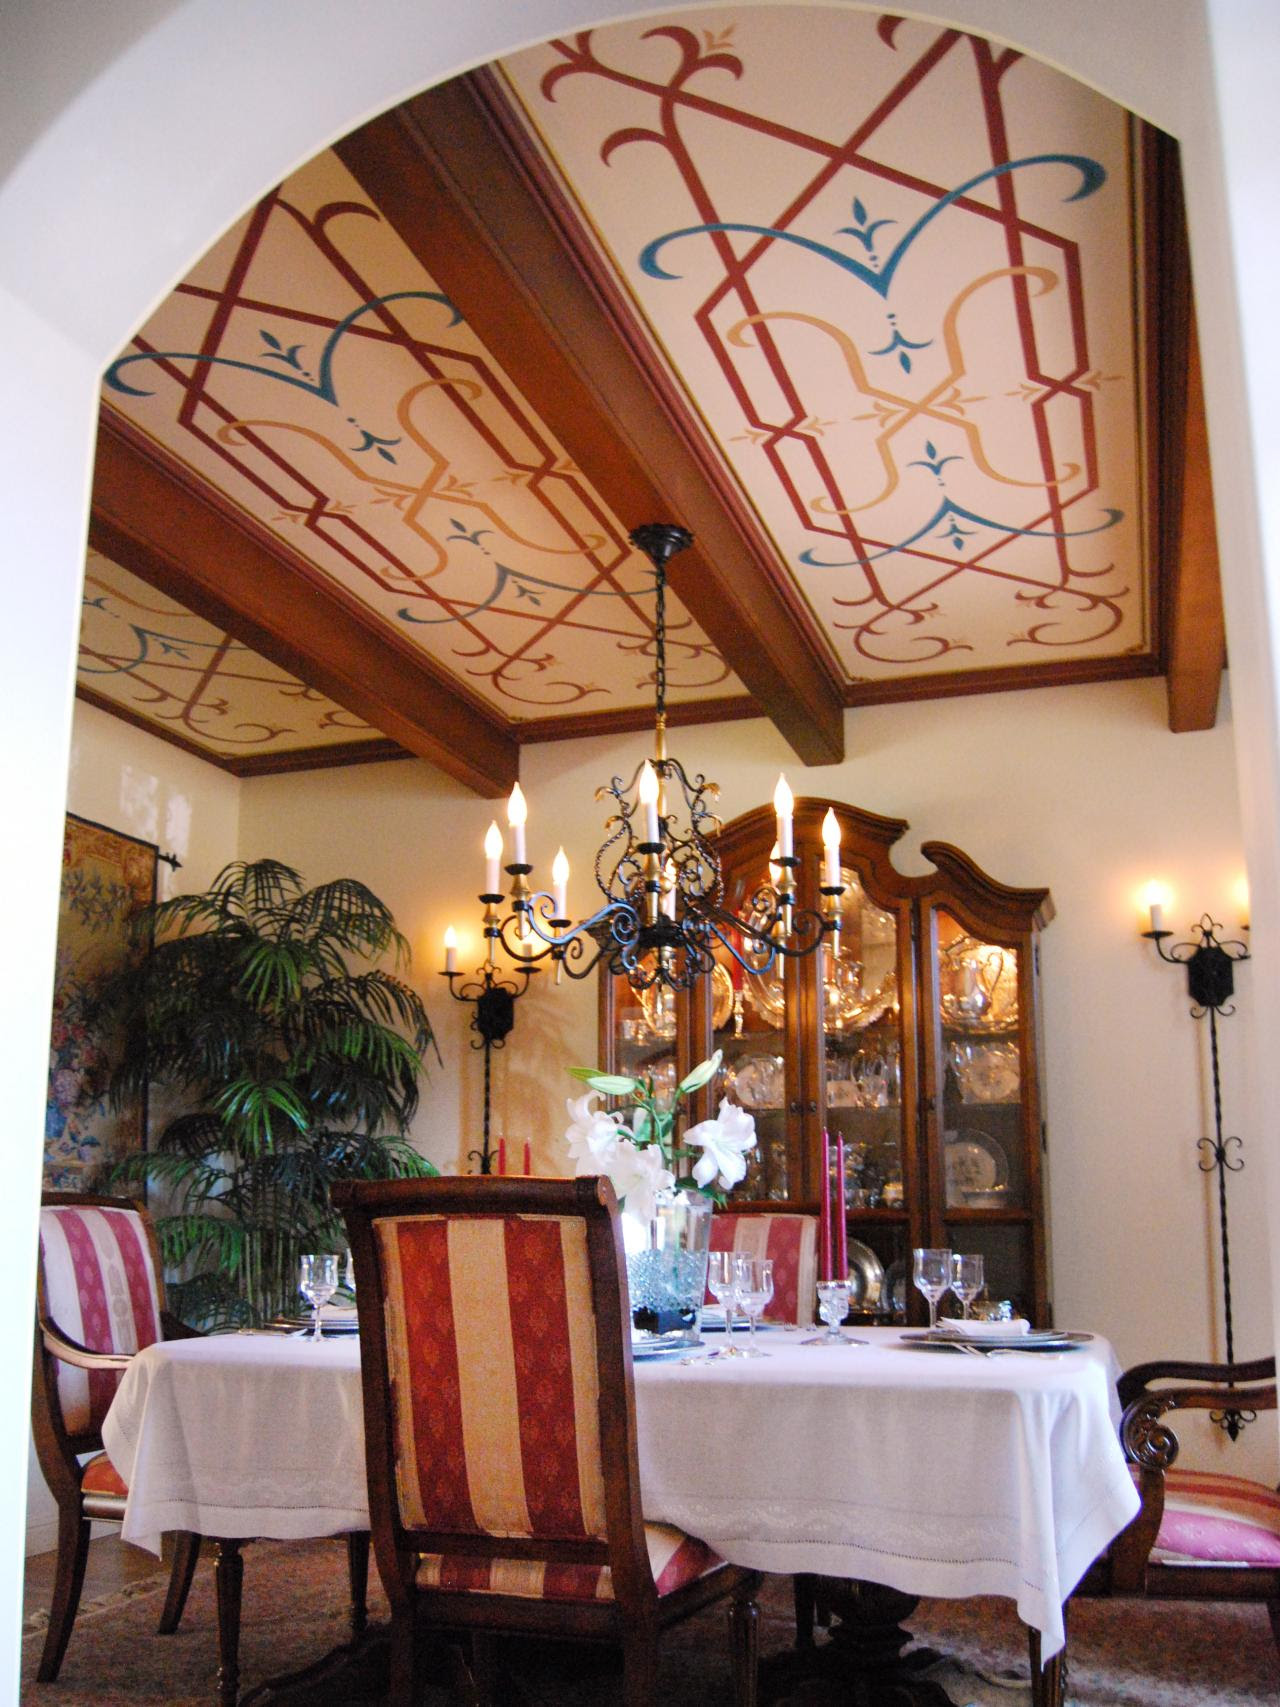 25 Mediterranean Dining Room Design Ideas - Decoration Love